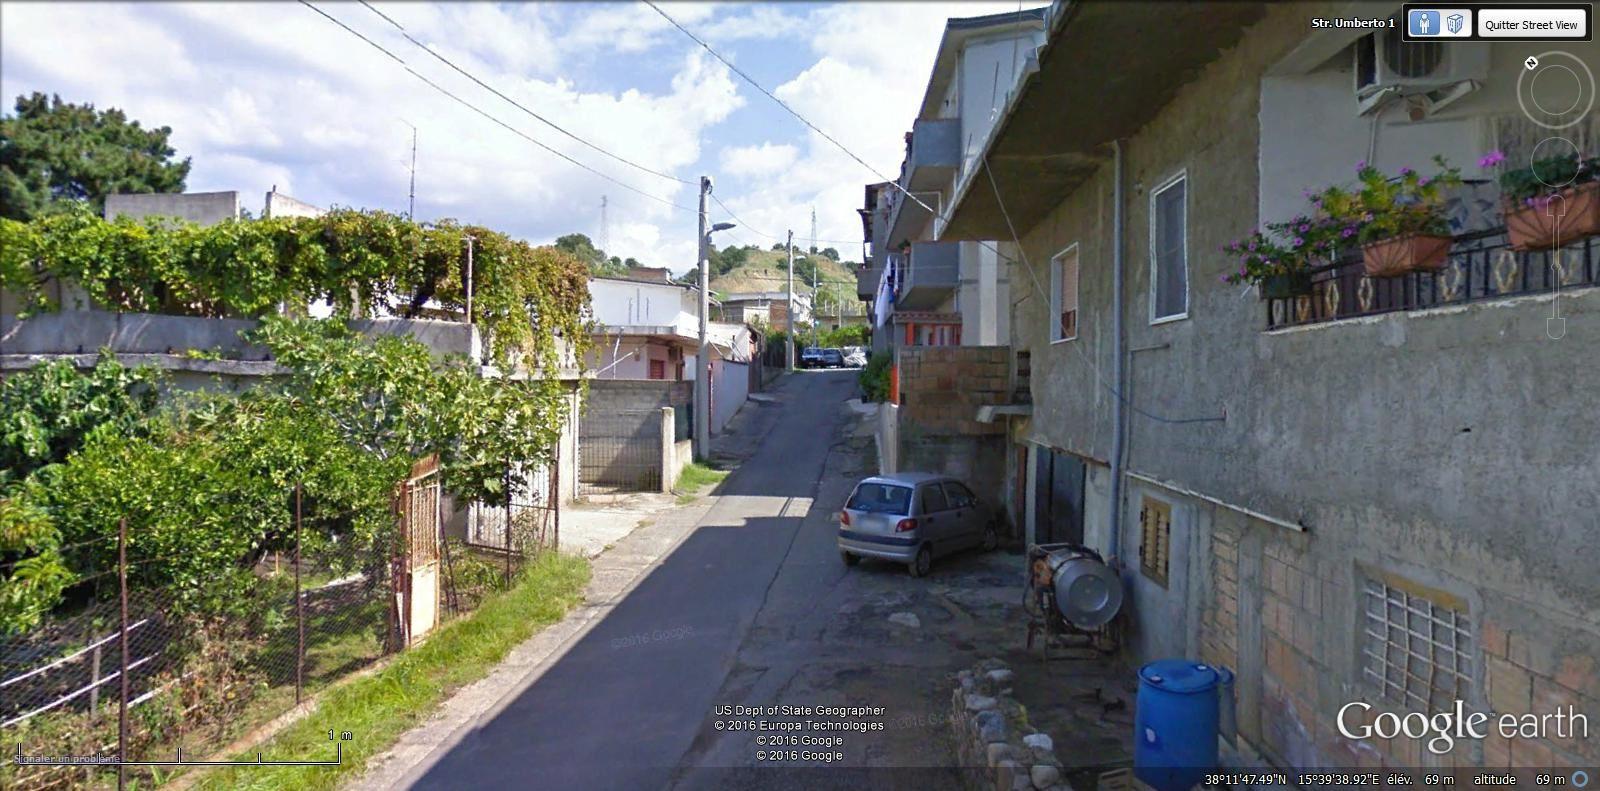 strada Umberto I